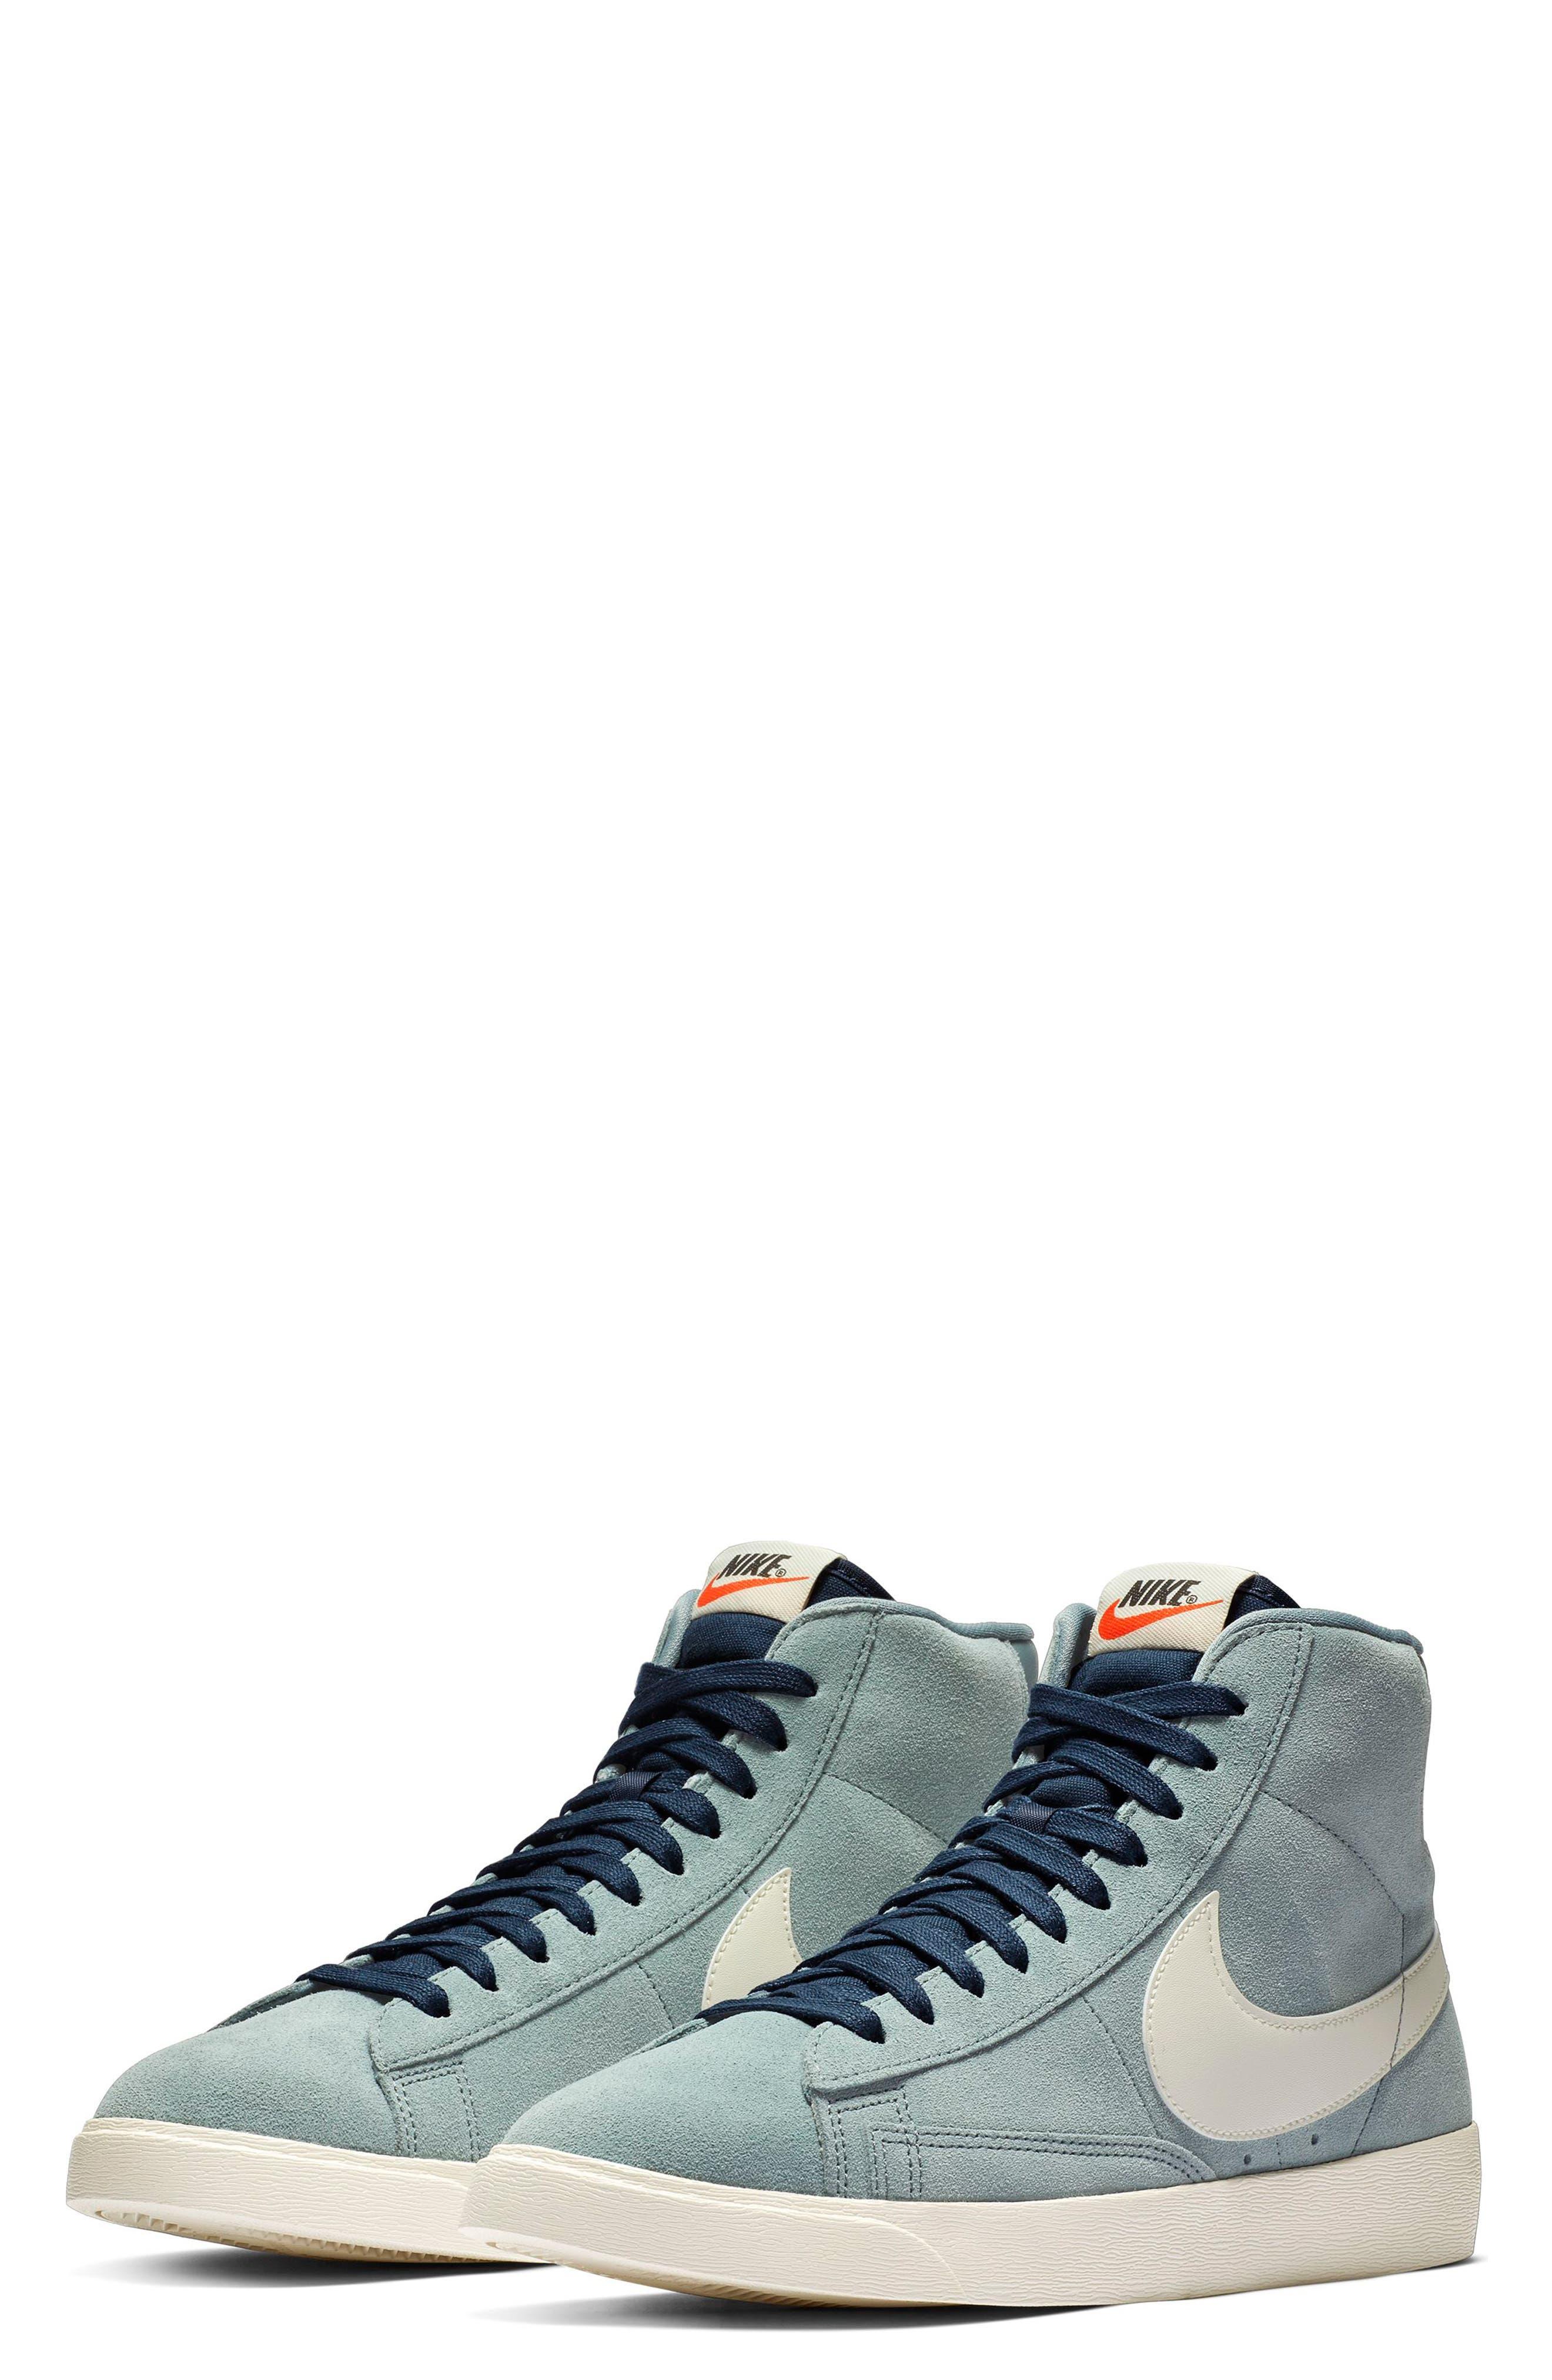 NIKE Blazer Mid Vintage Sneaker, Main, color, AVIATOR GREY/ SAIL/ BLUE